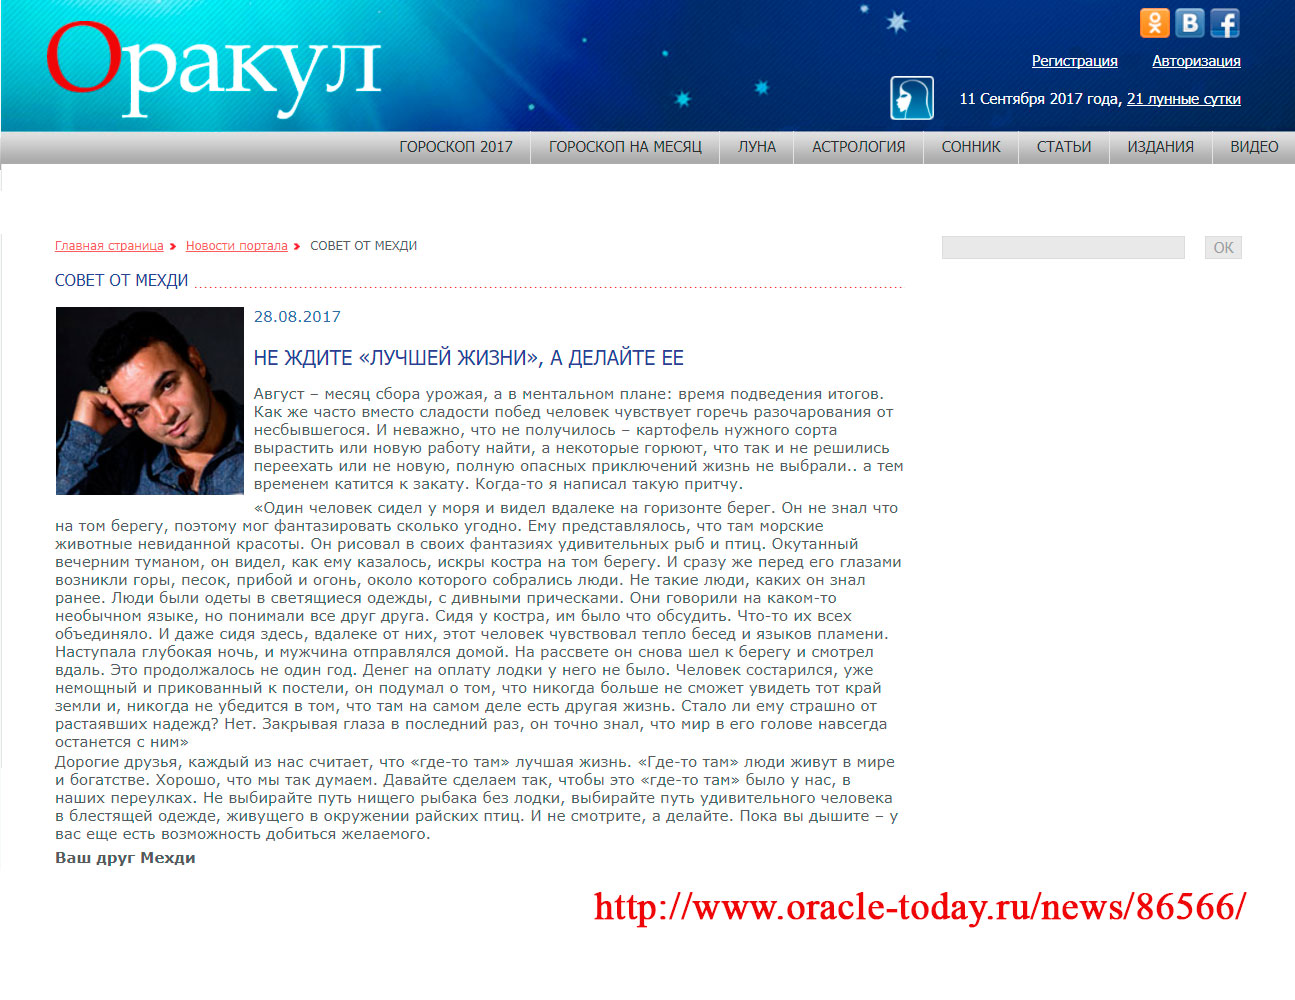 orakul-today-11-09-2017